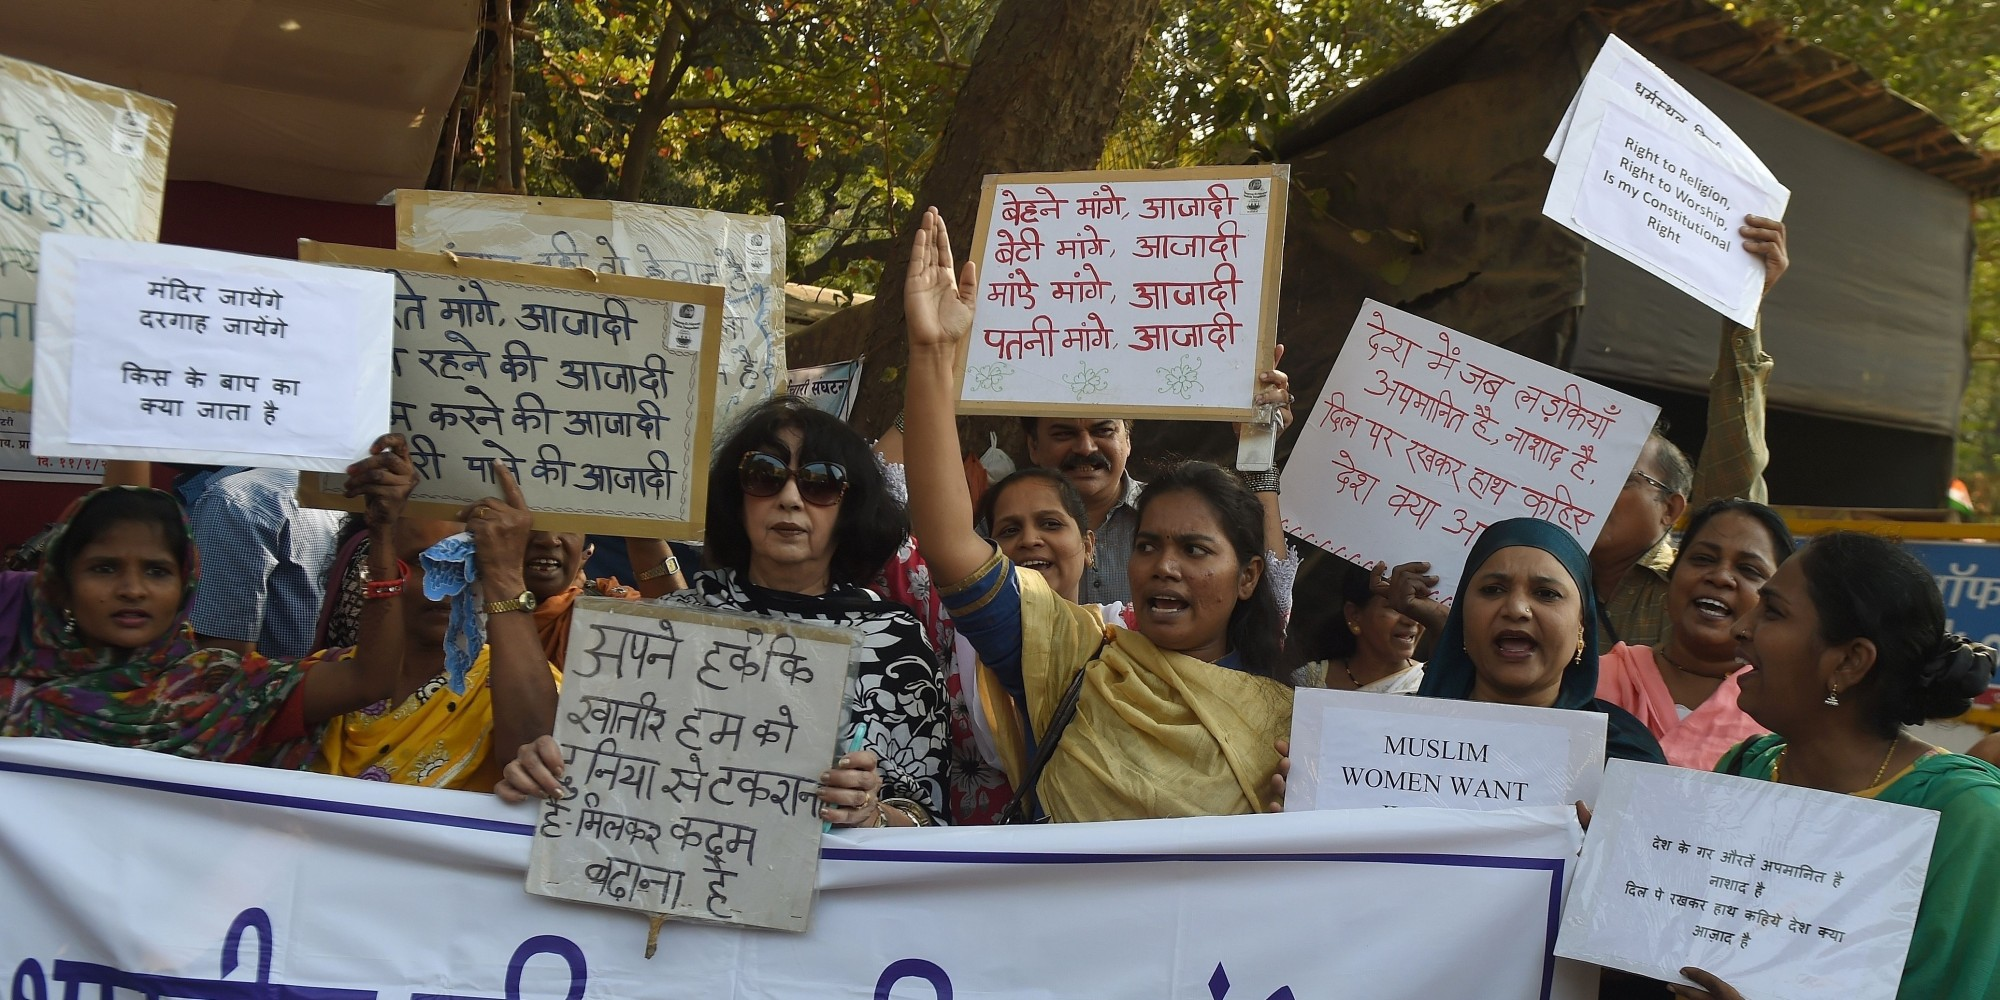 INDIA-RELIGION-RIGHTS-WOMEN